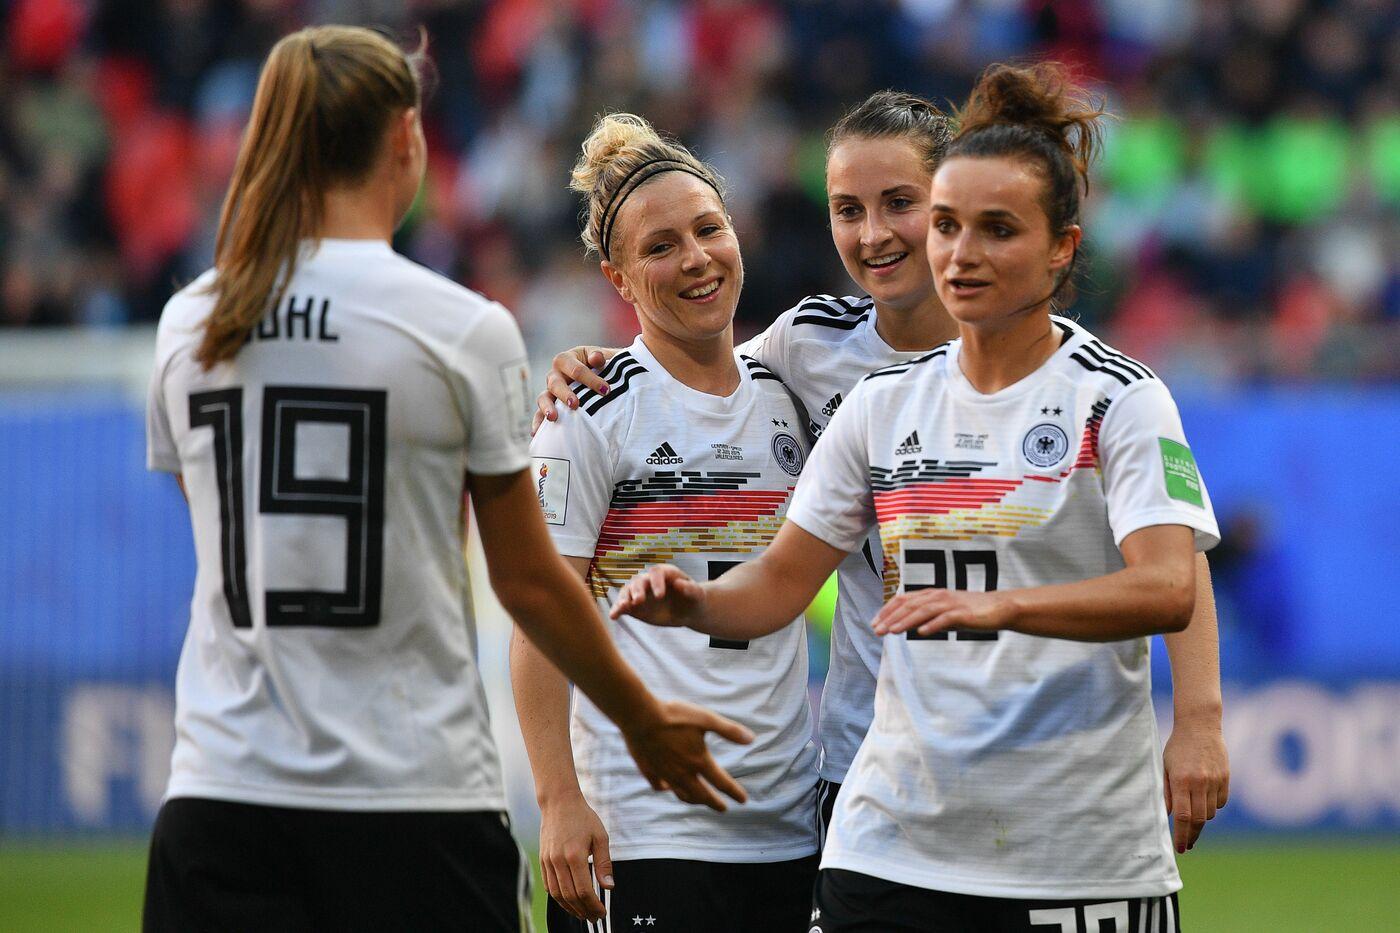 qualificazioni-europei-donne-pronostici-8-ottobre